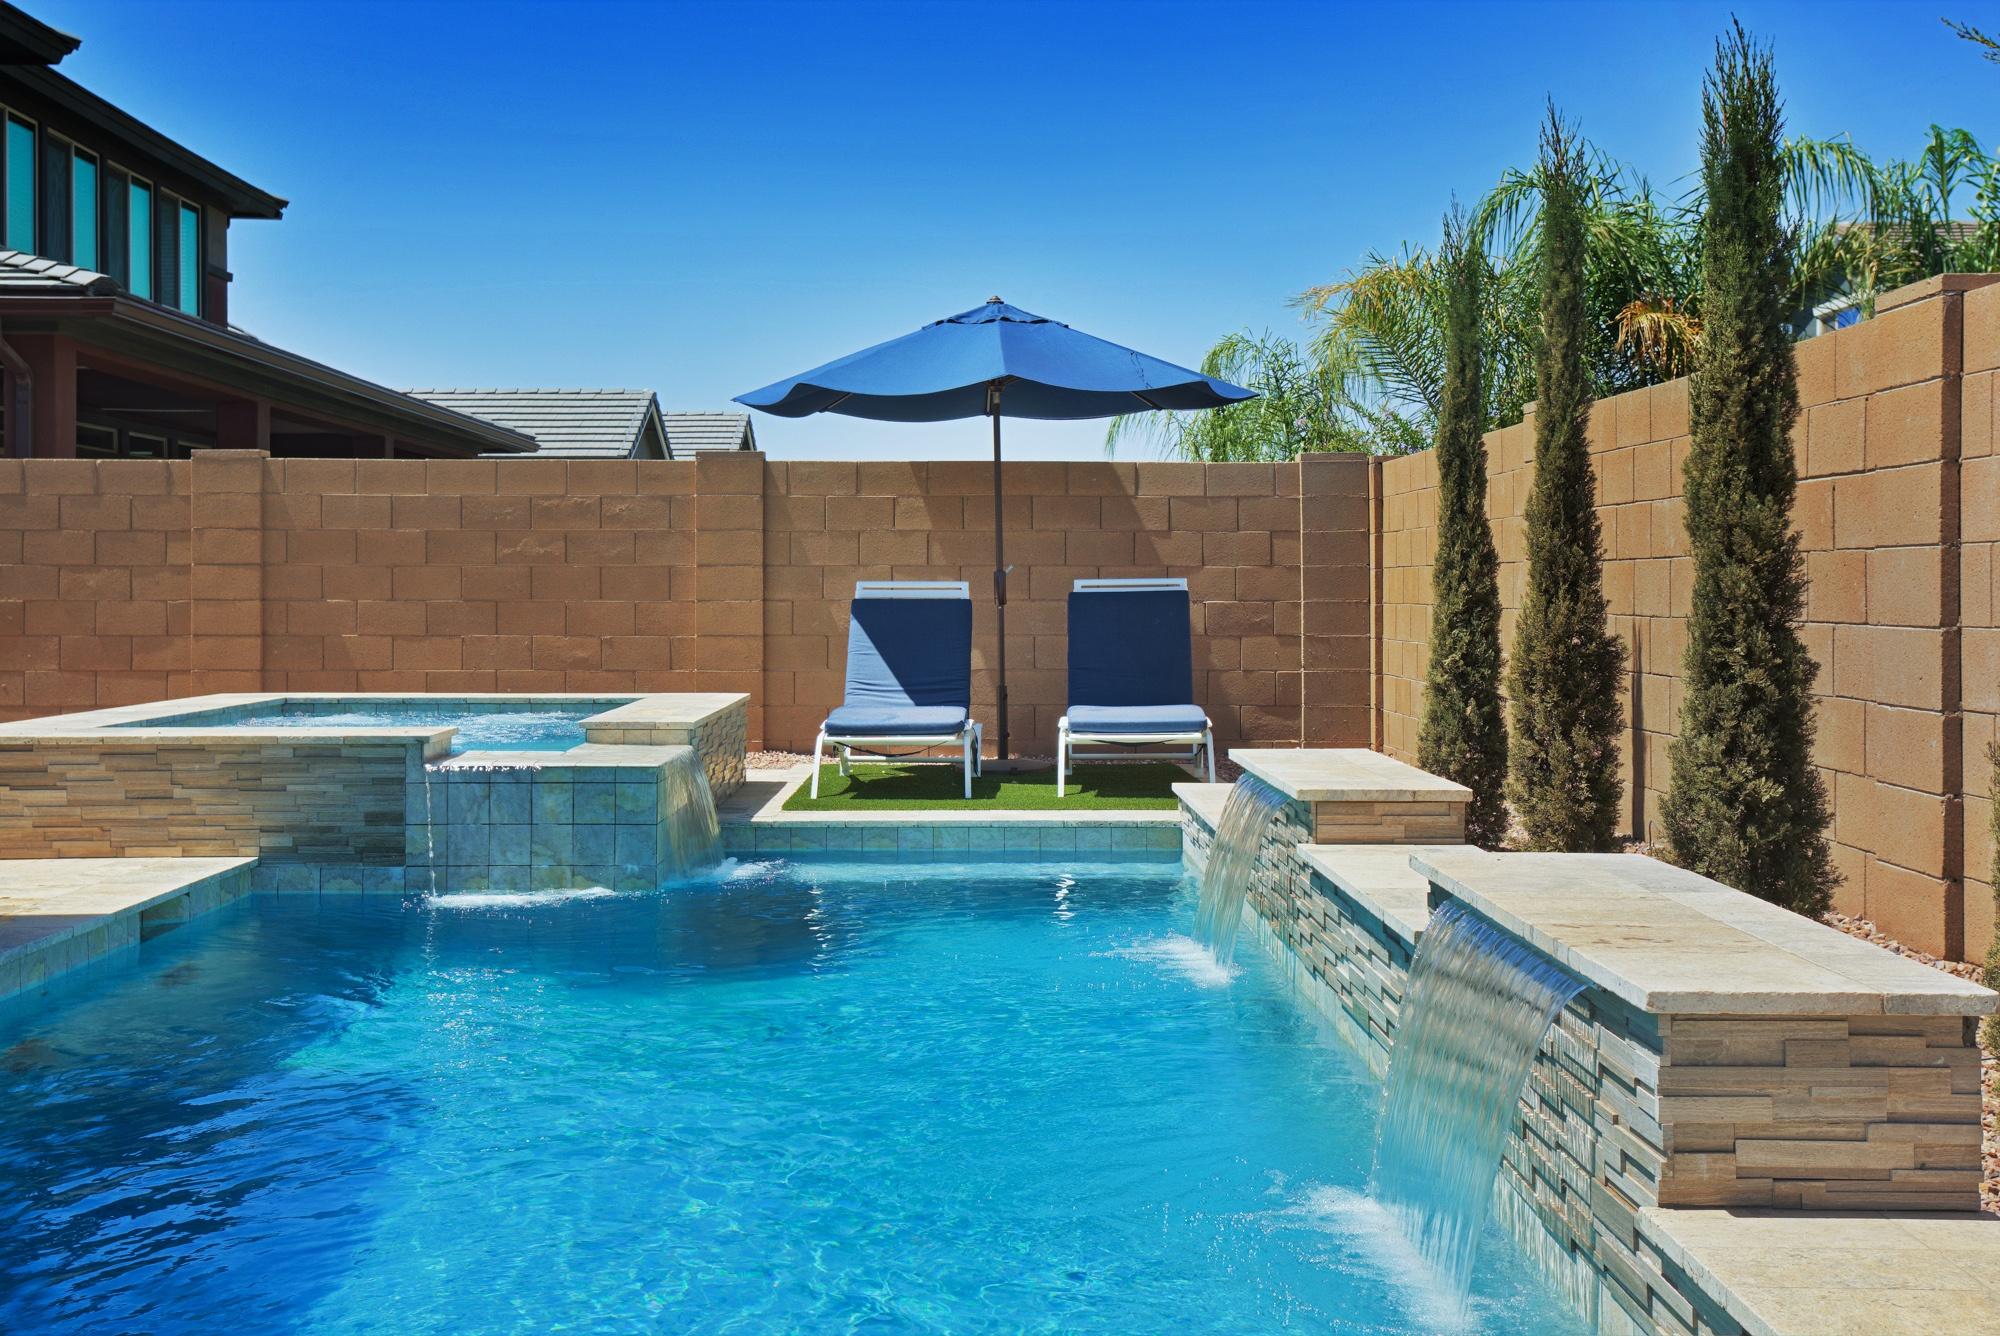 Pool Design Spotlight: A Compact, Modern Masterpiece